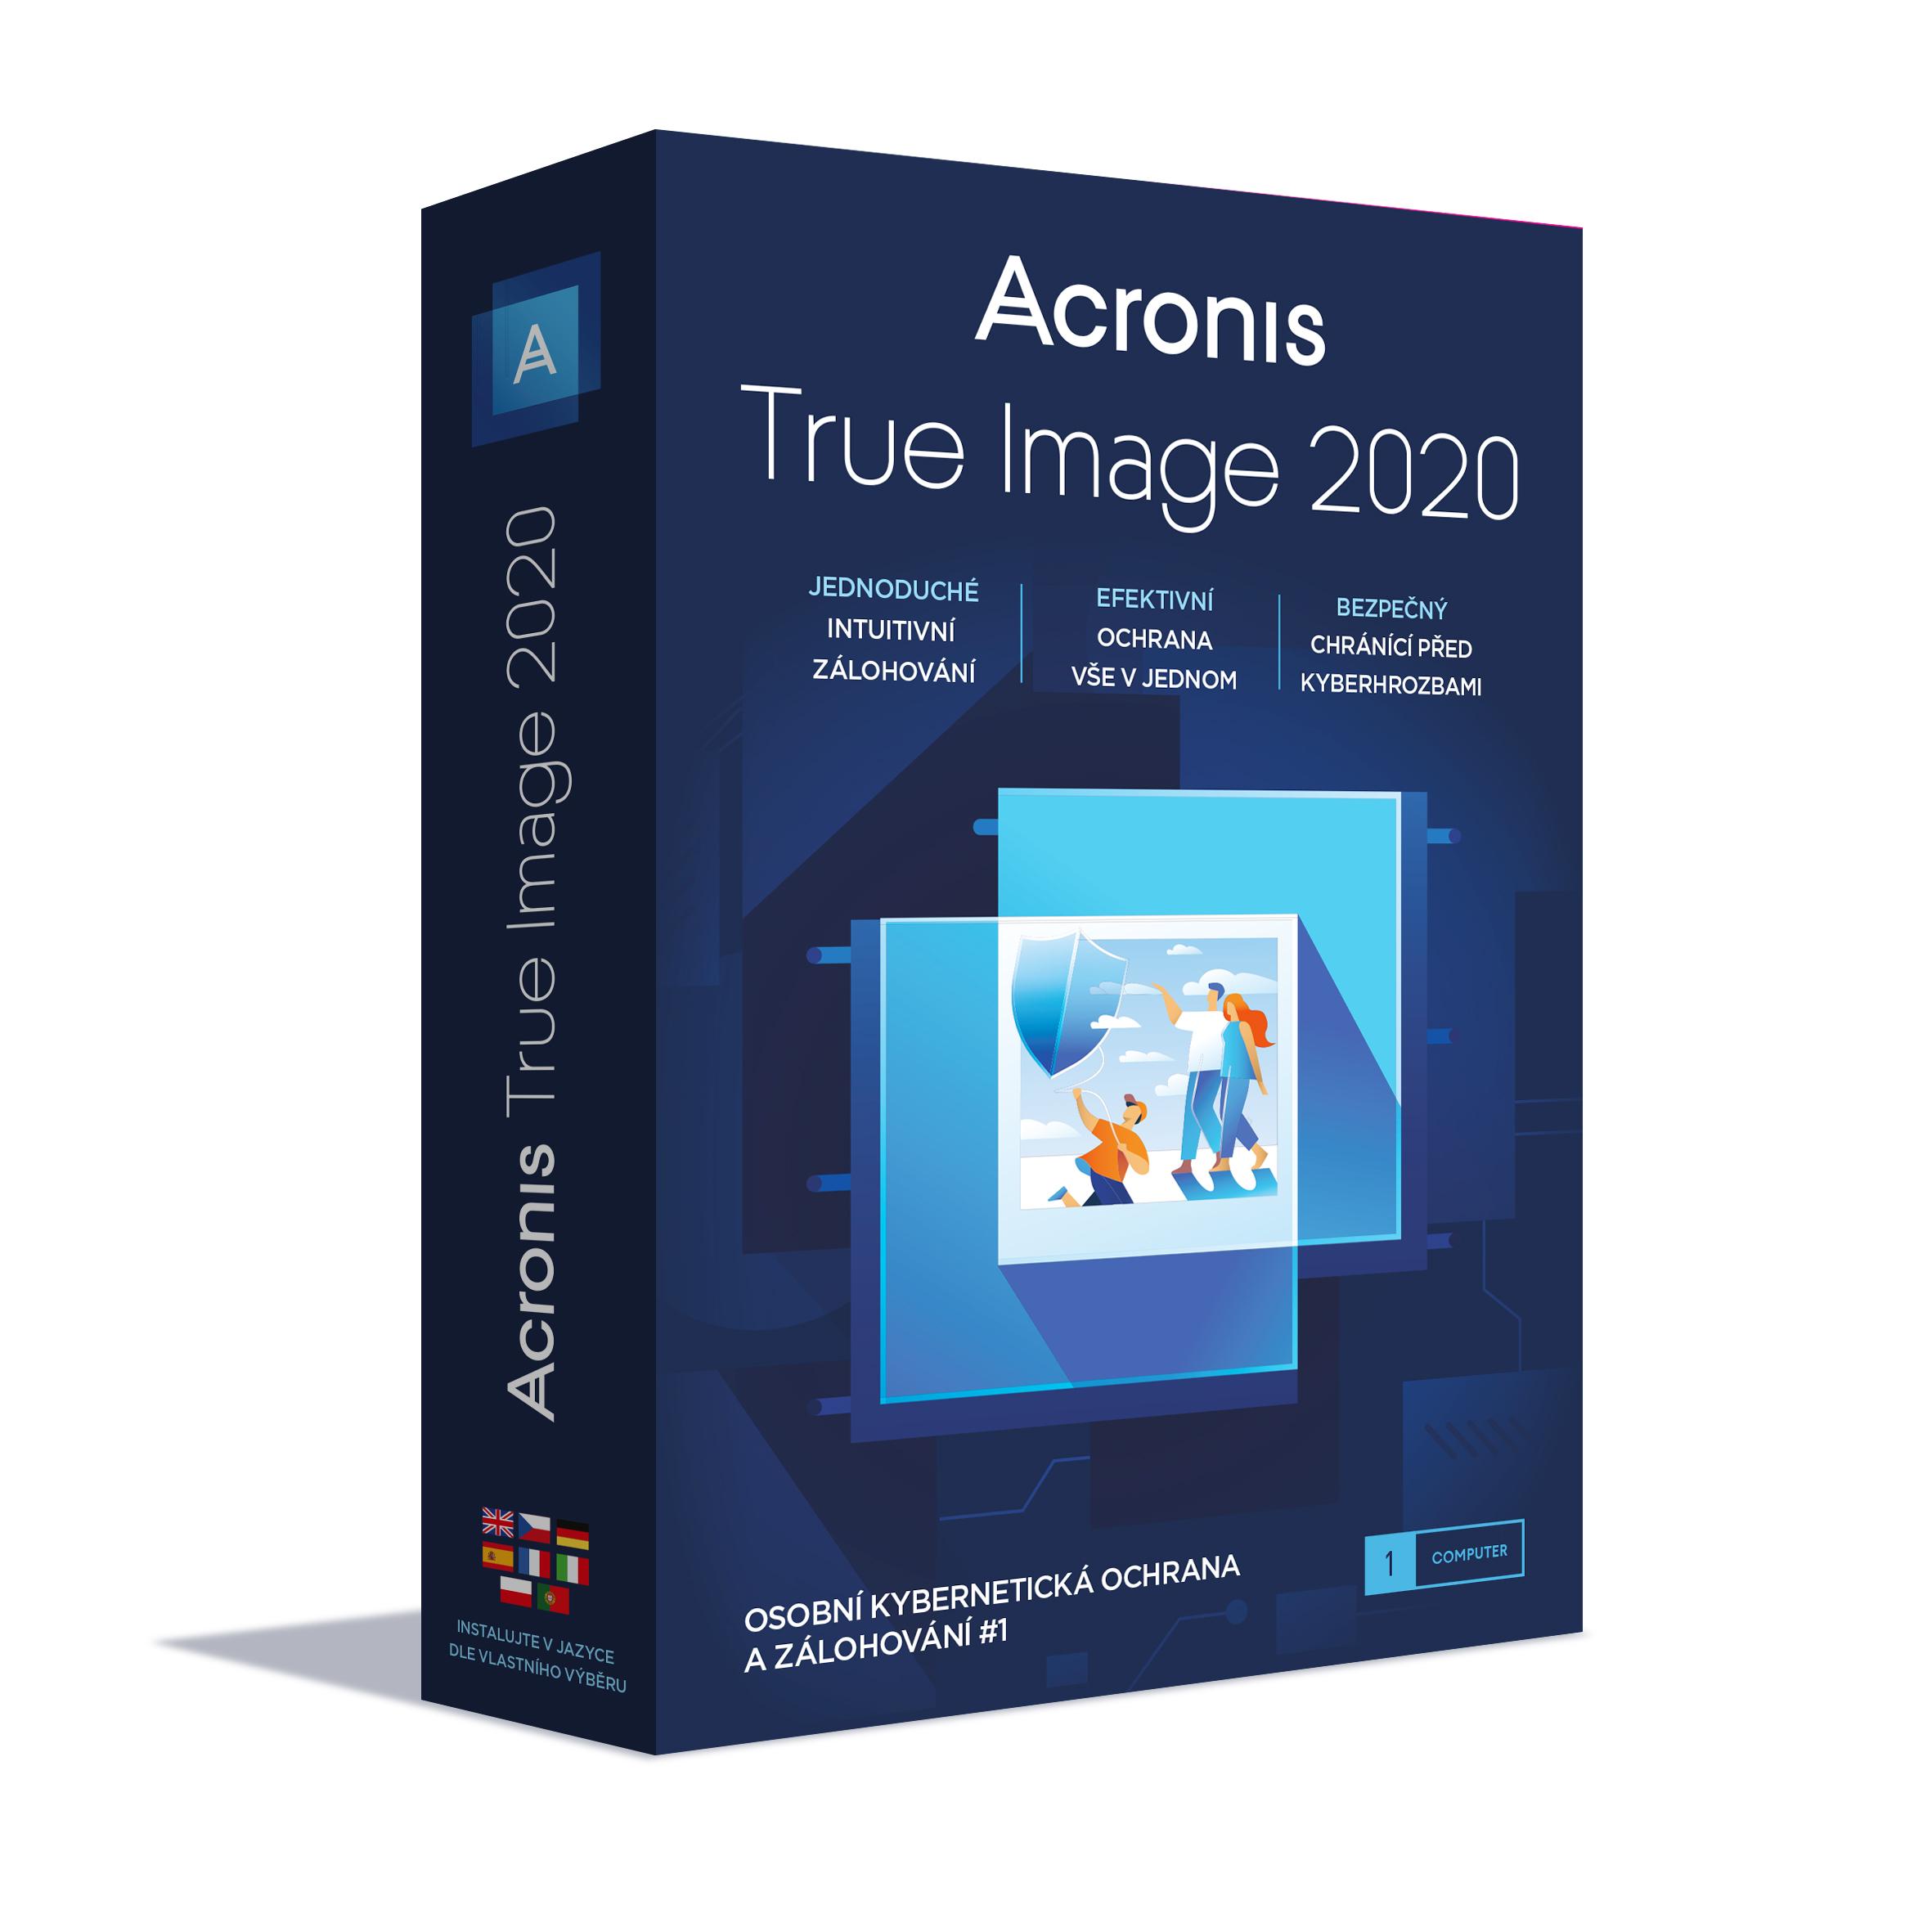 Acronis True Image 2020 - 1 Computer BOX